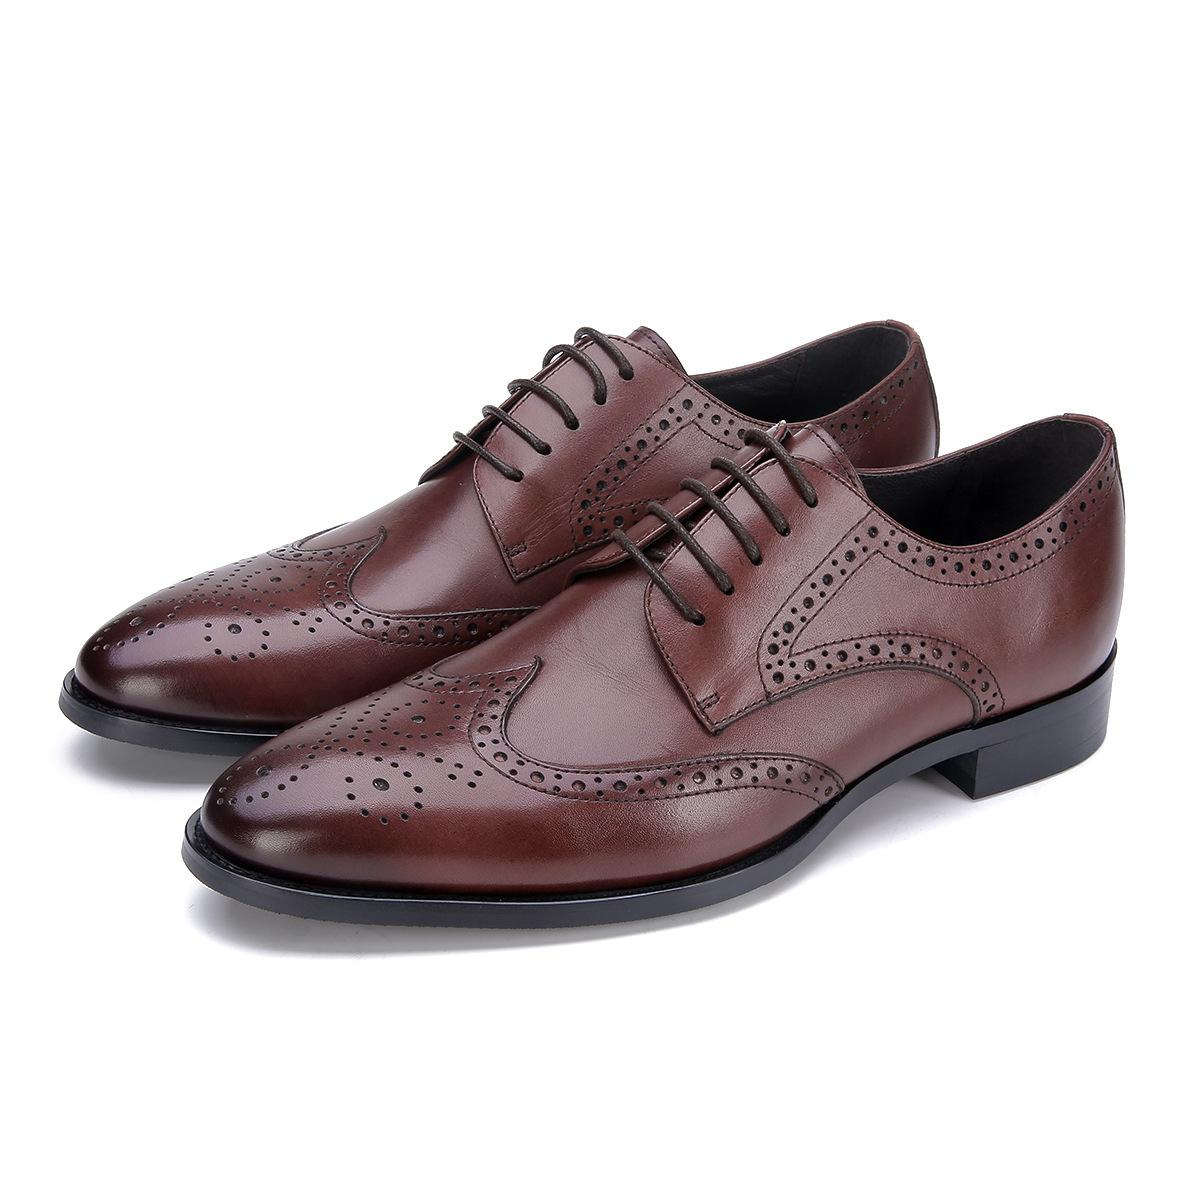 Men's Leather Shoes Varved Men's Leather Shoes Zapatos De Hombre Comfortable Leather Breathable Wedding Wear